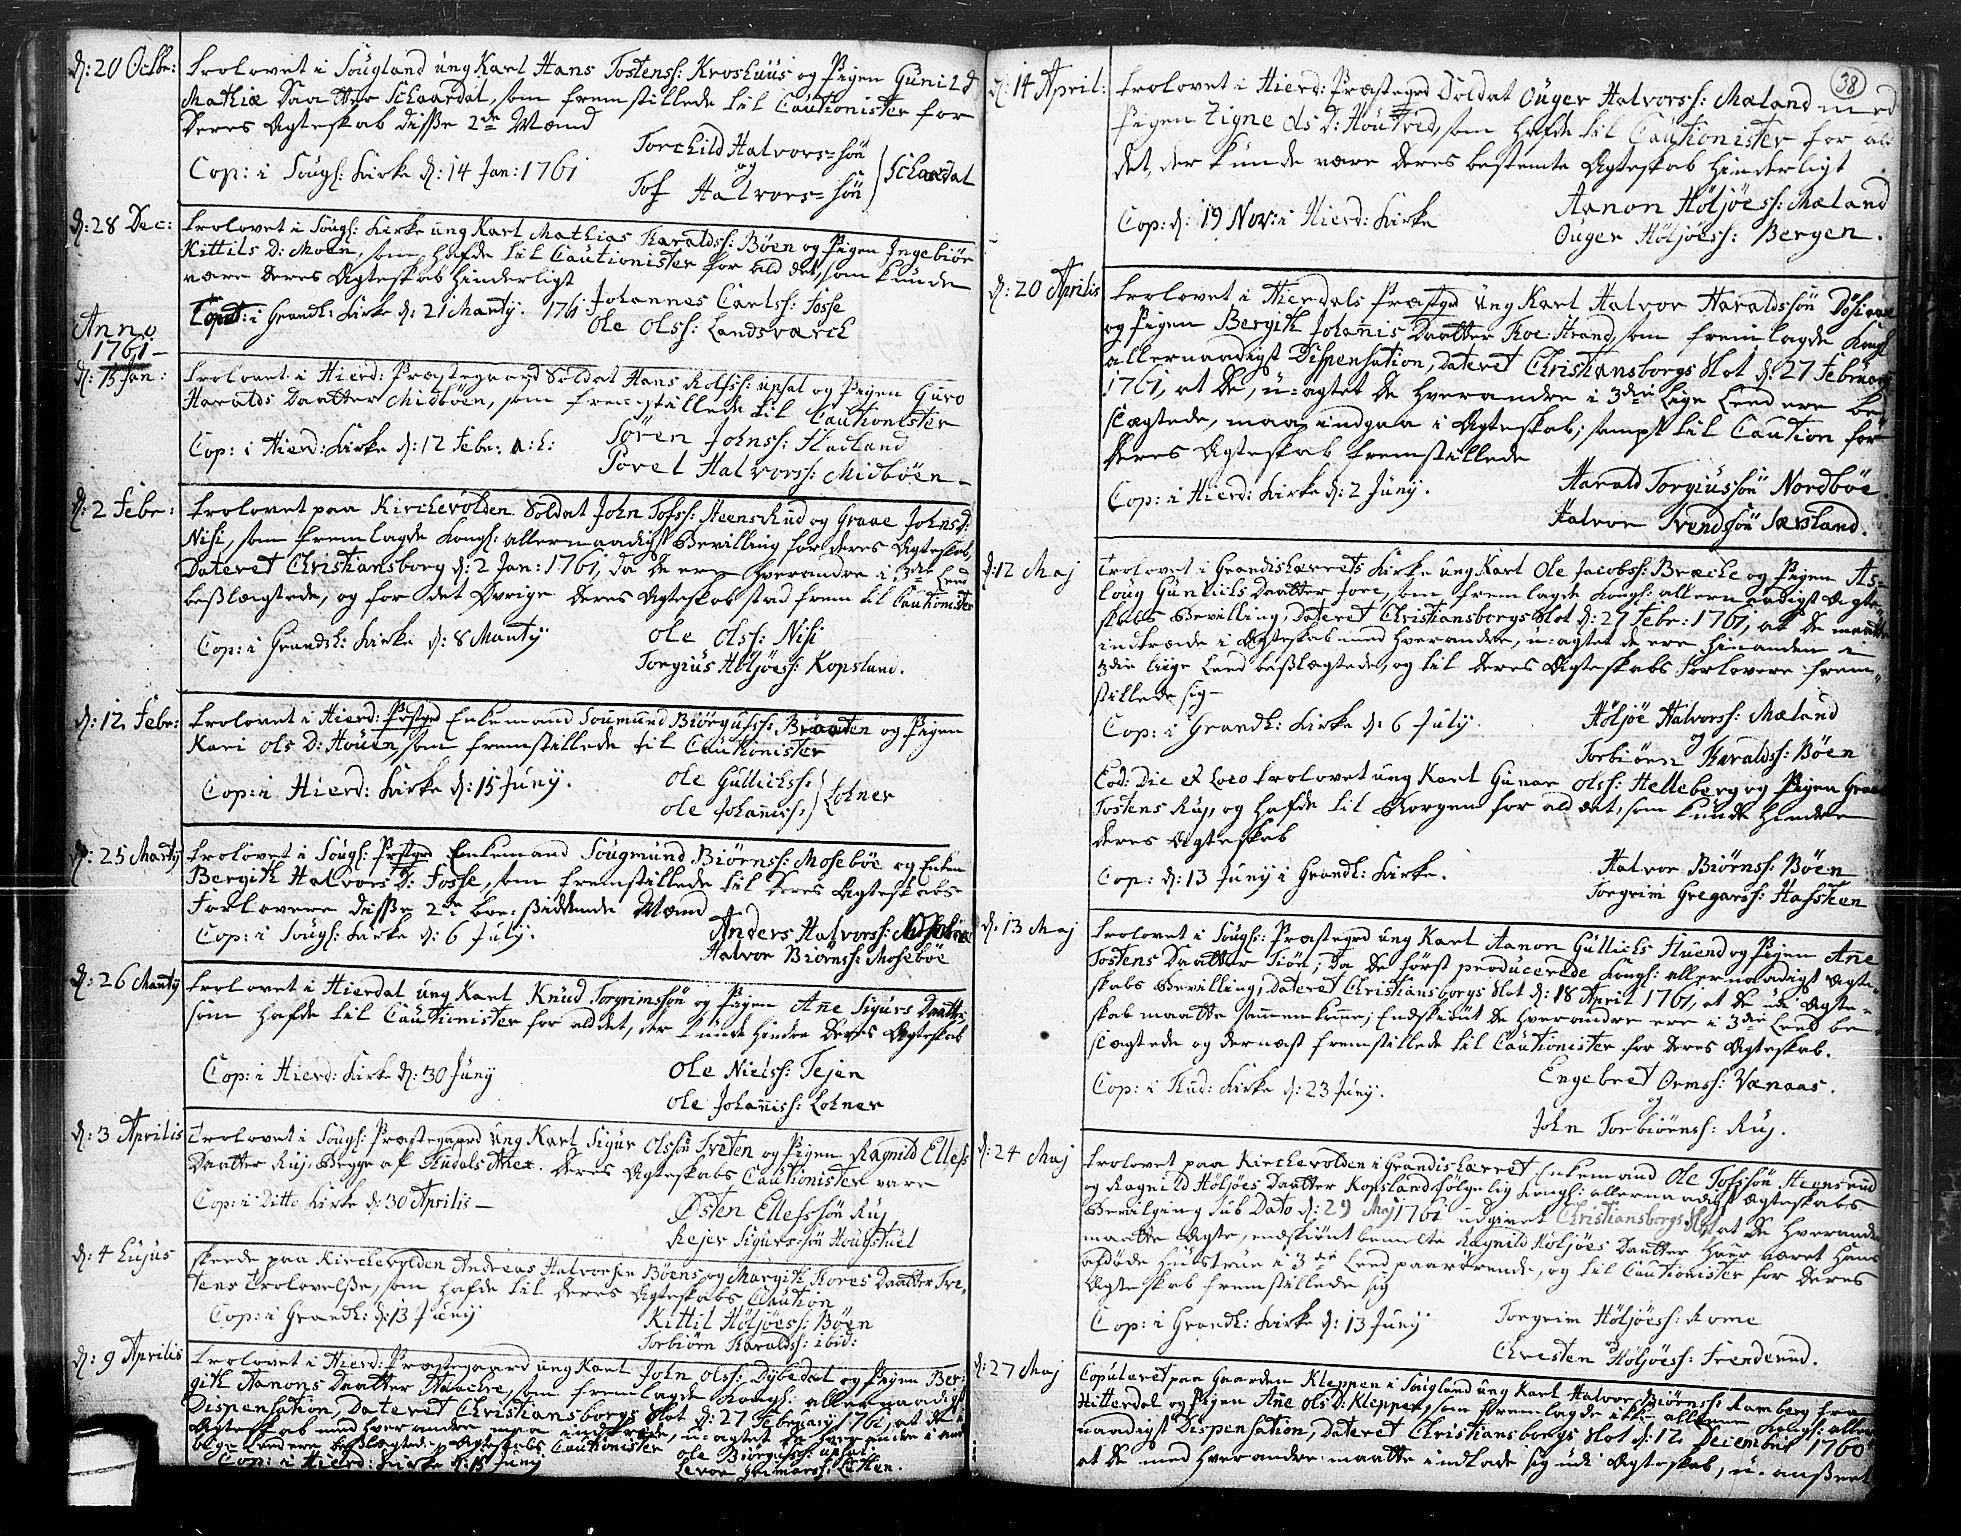 SAKO, Hjartdal kirkebøker, F/Fa/L0004: Ministerialbok nr. I 4, 1727-1795, s. 38